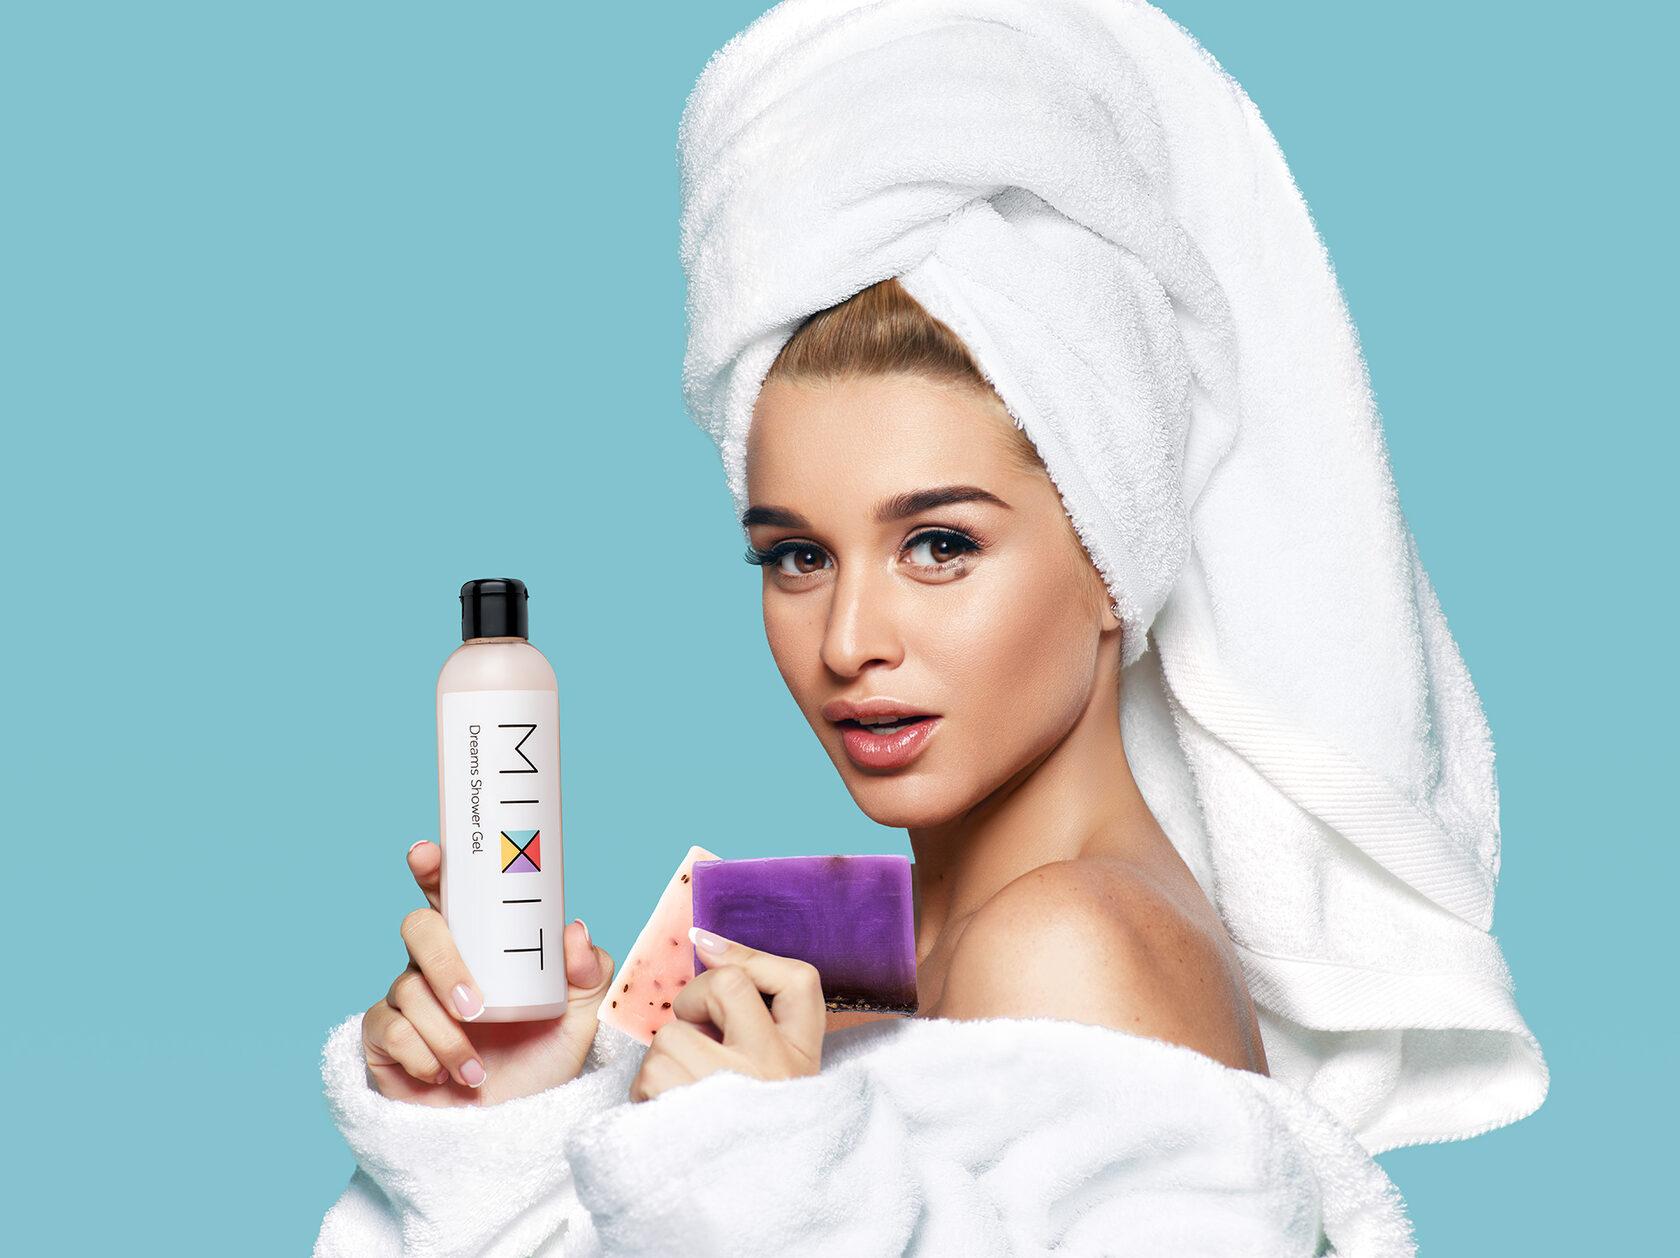 Магазин косметики франшиза купить   Купить франшизу. ру